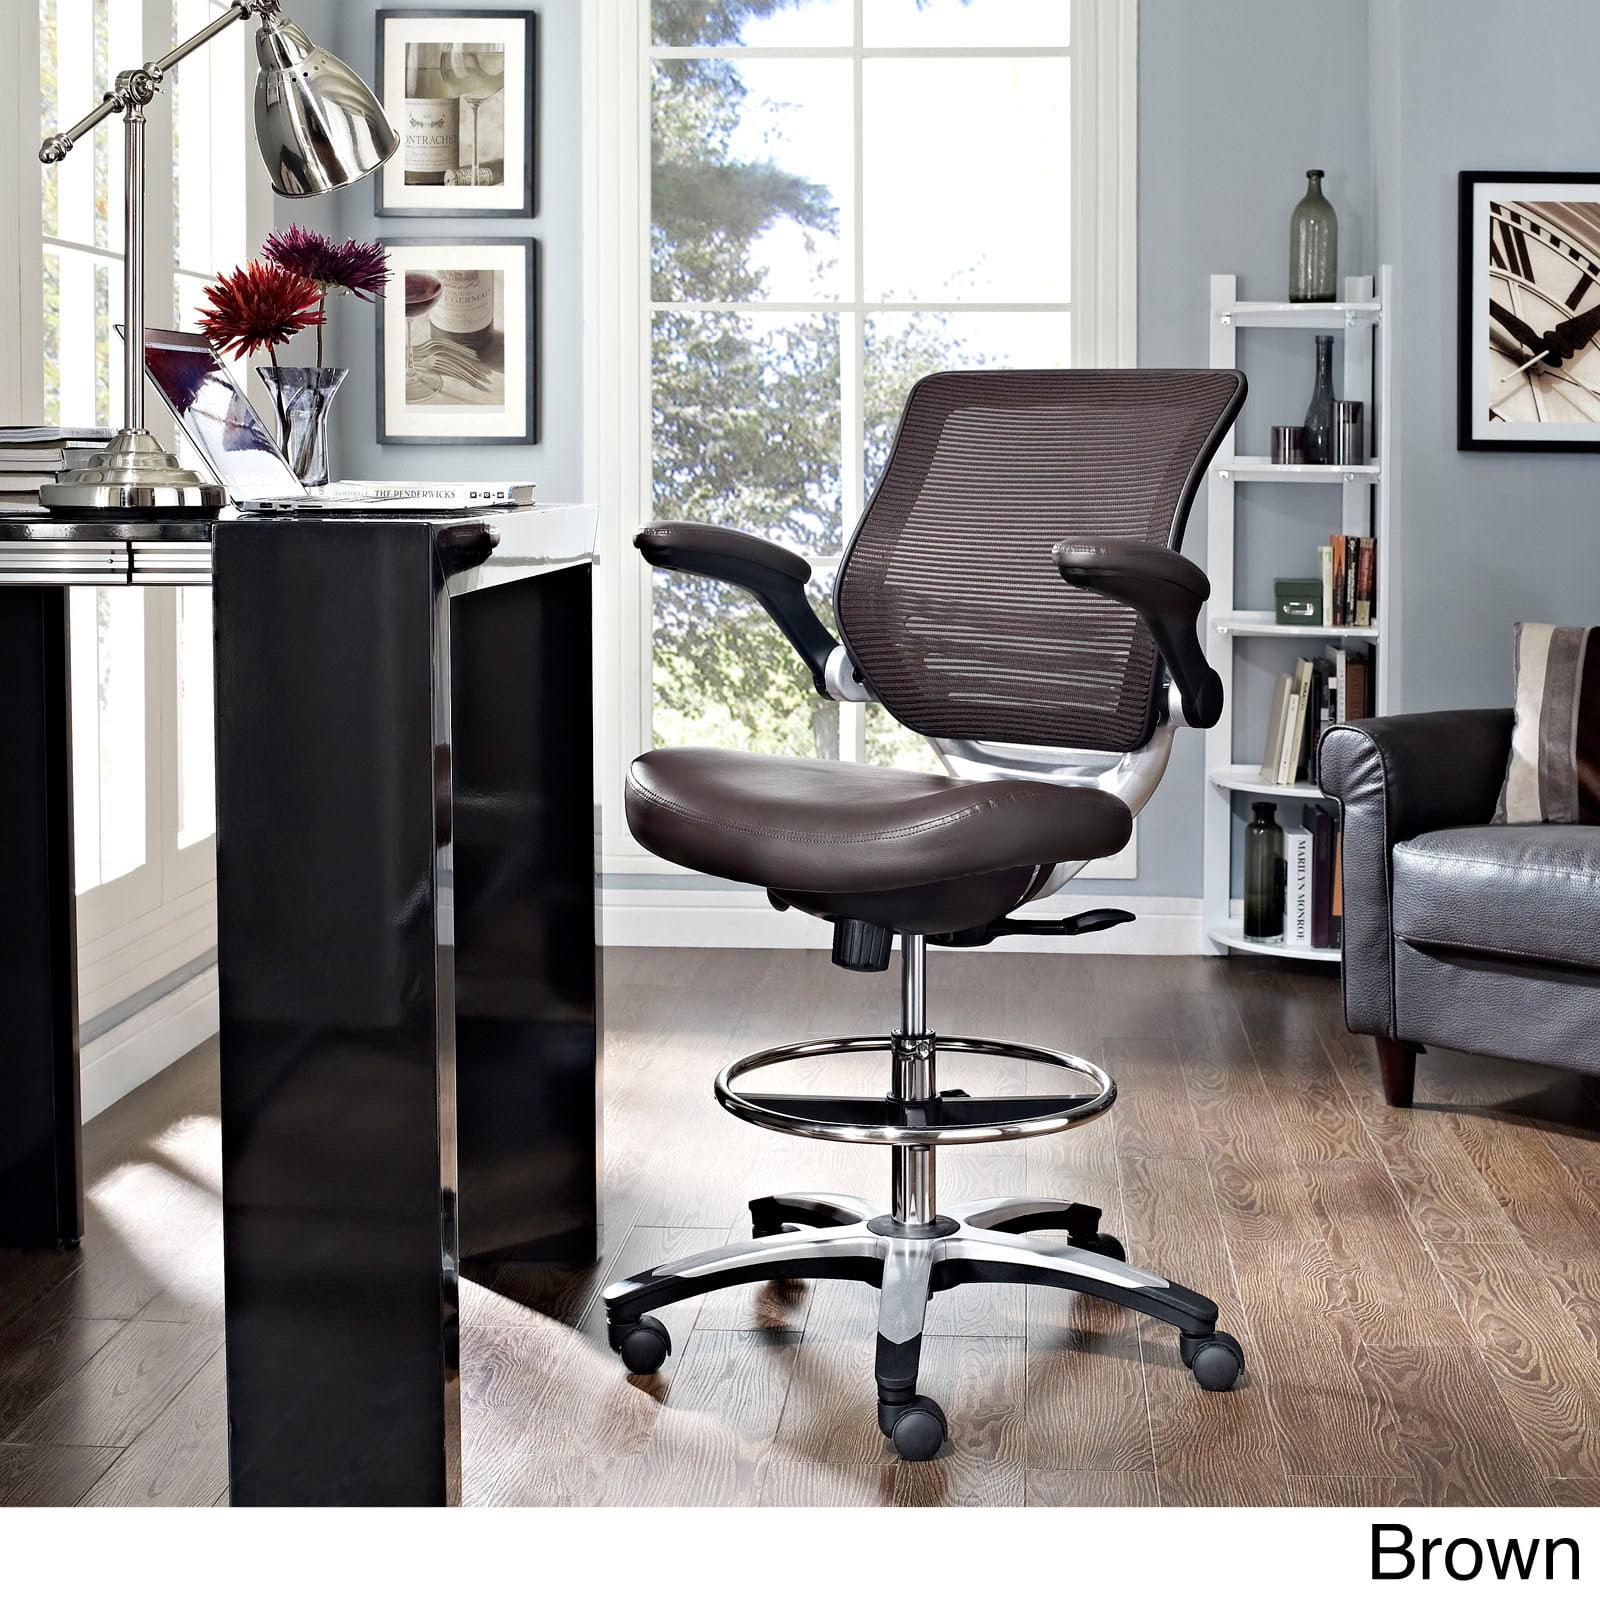 Modway Edge Drafting Chair - Walmart.com - Walmart.com